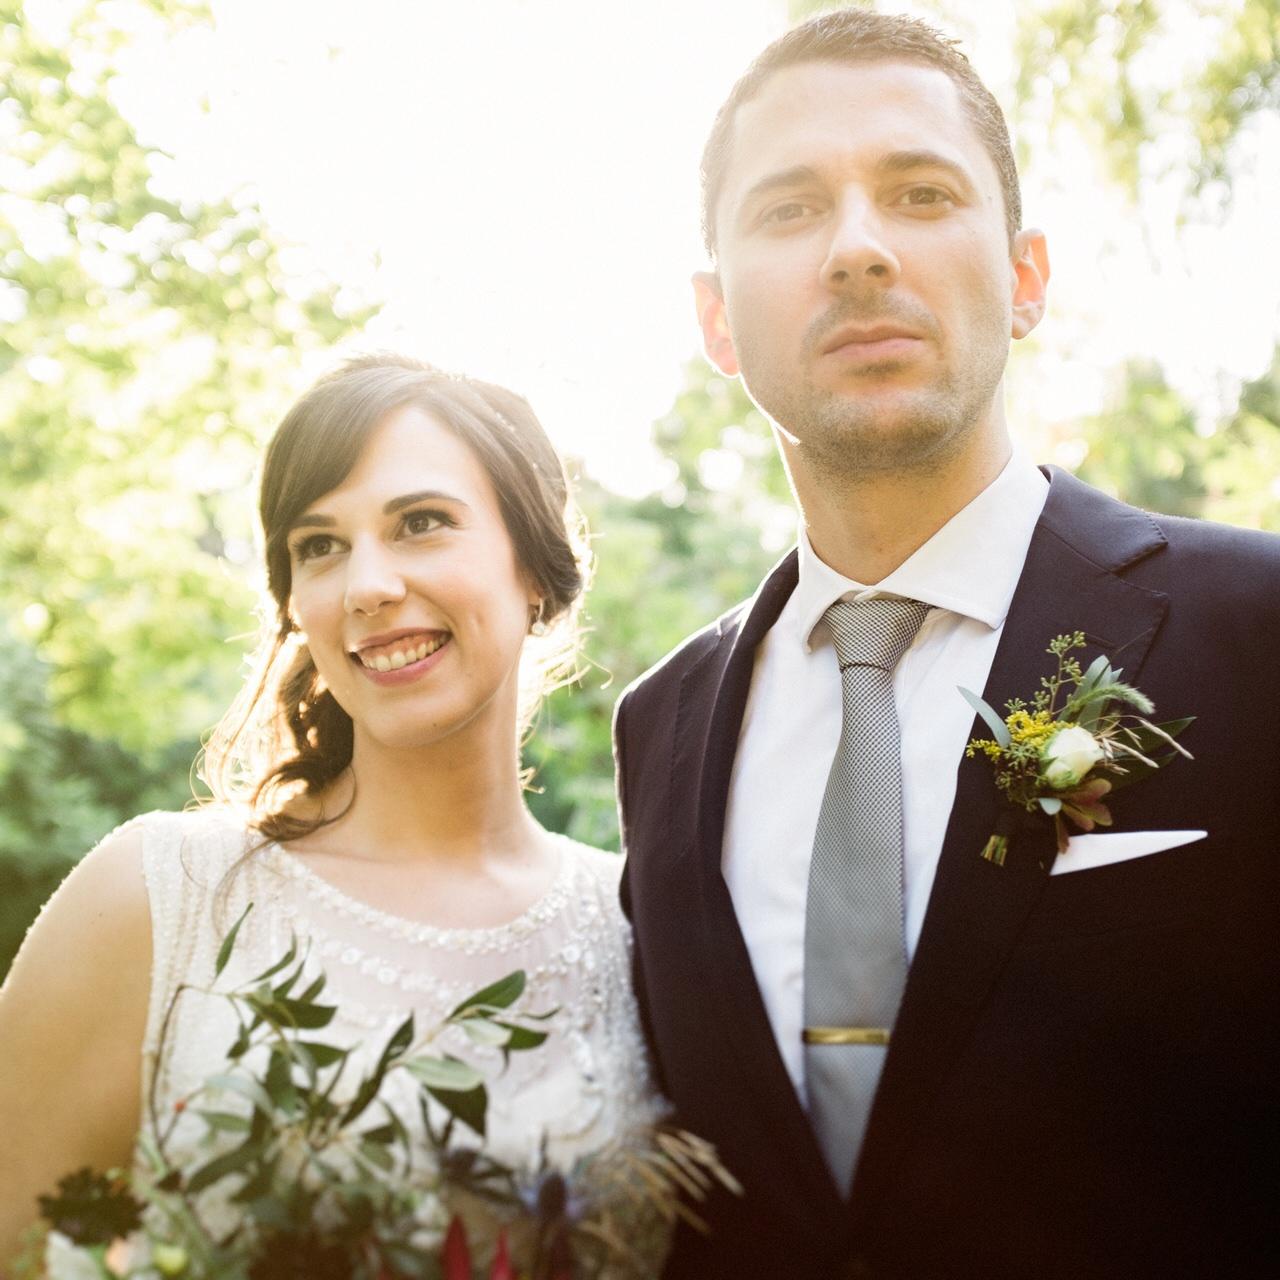 chryssi_romain_wedding_243-2-1.JPG